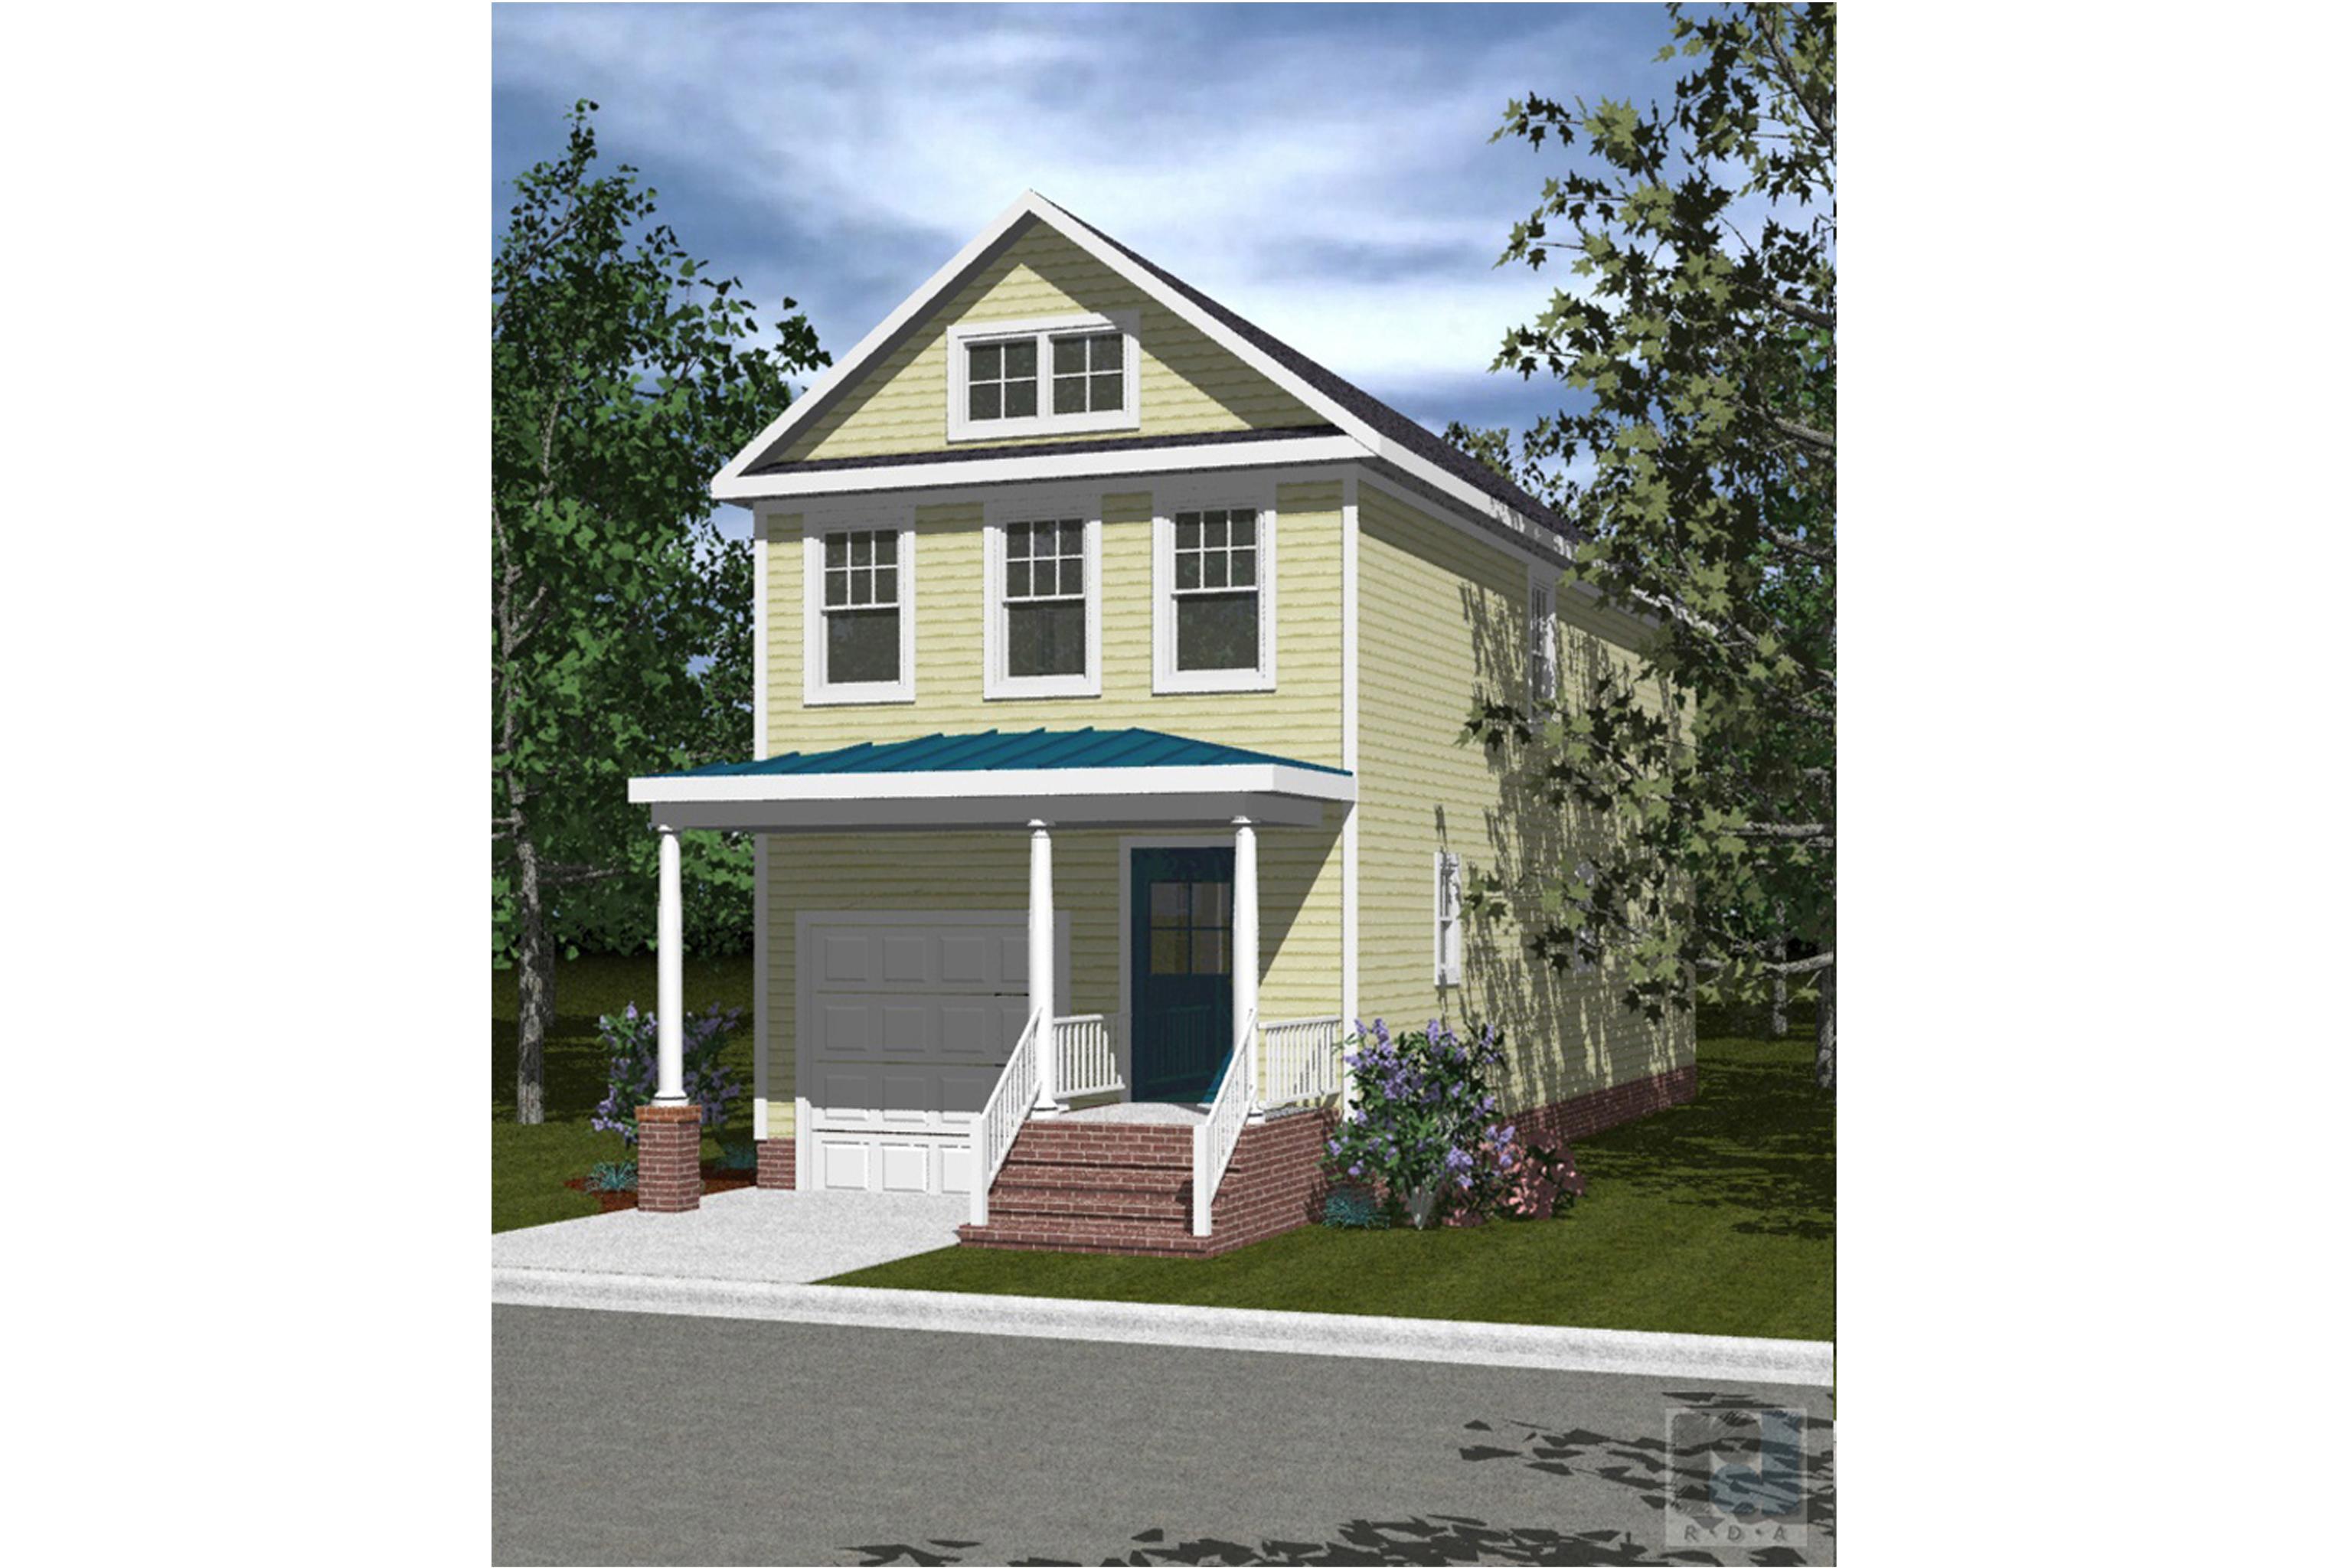 House Plan 164 - Graydon 3